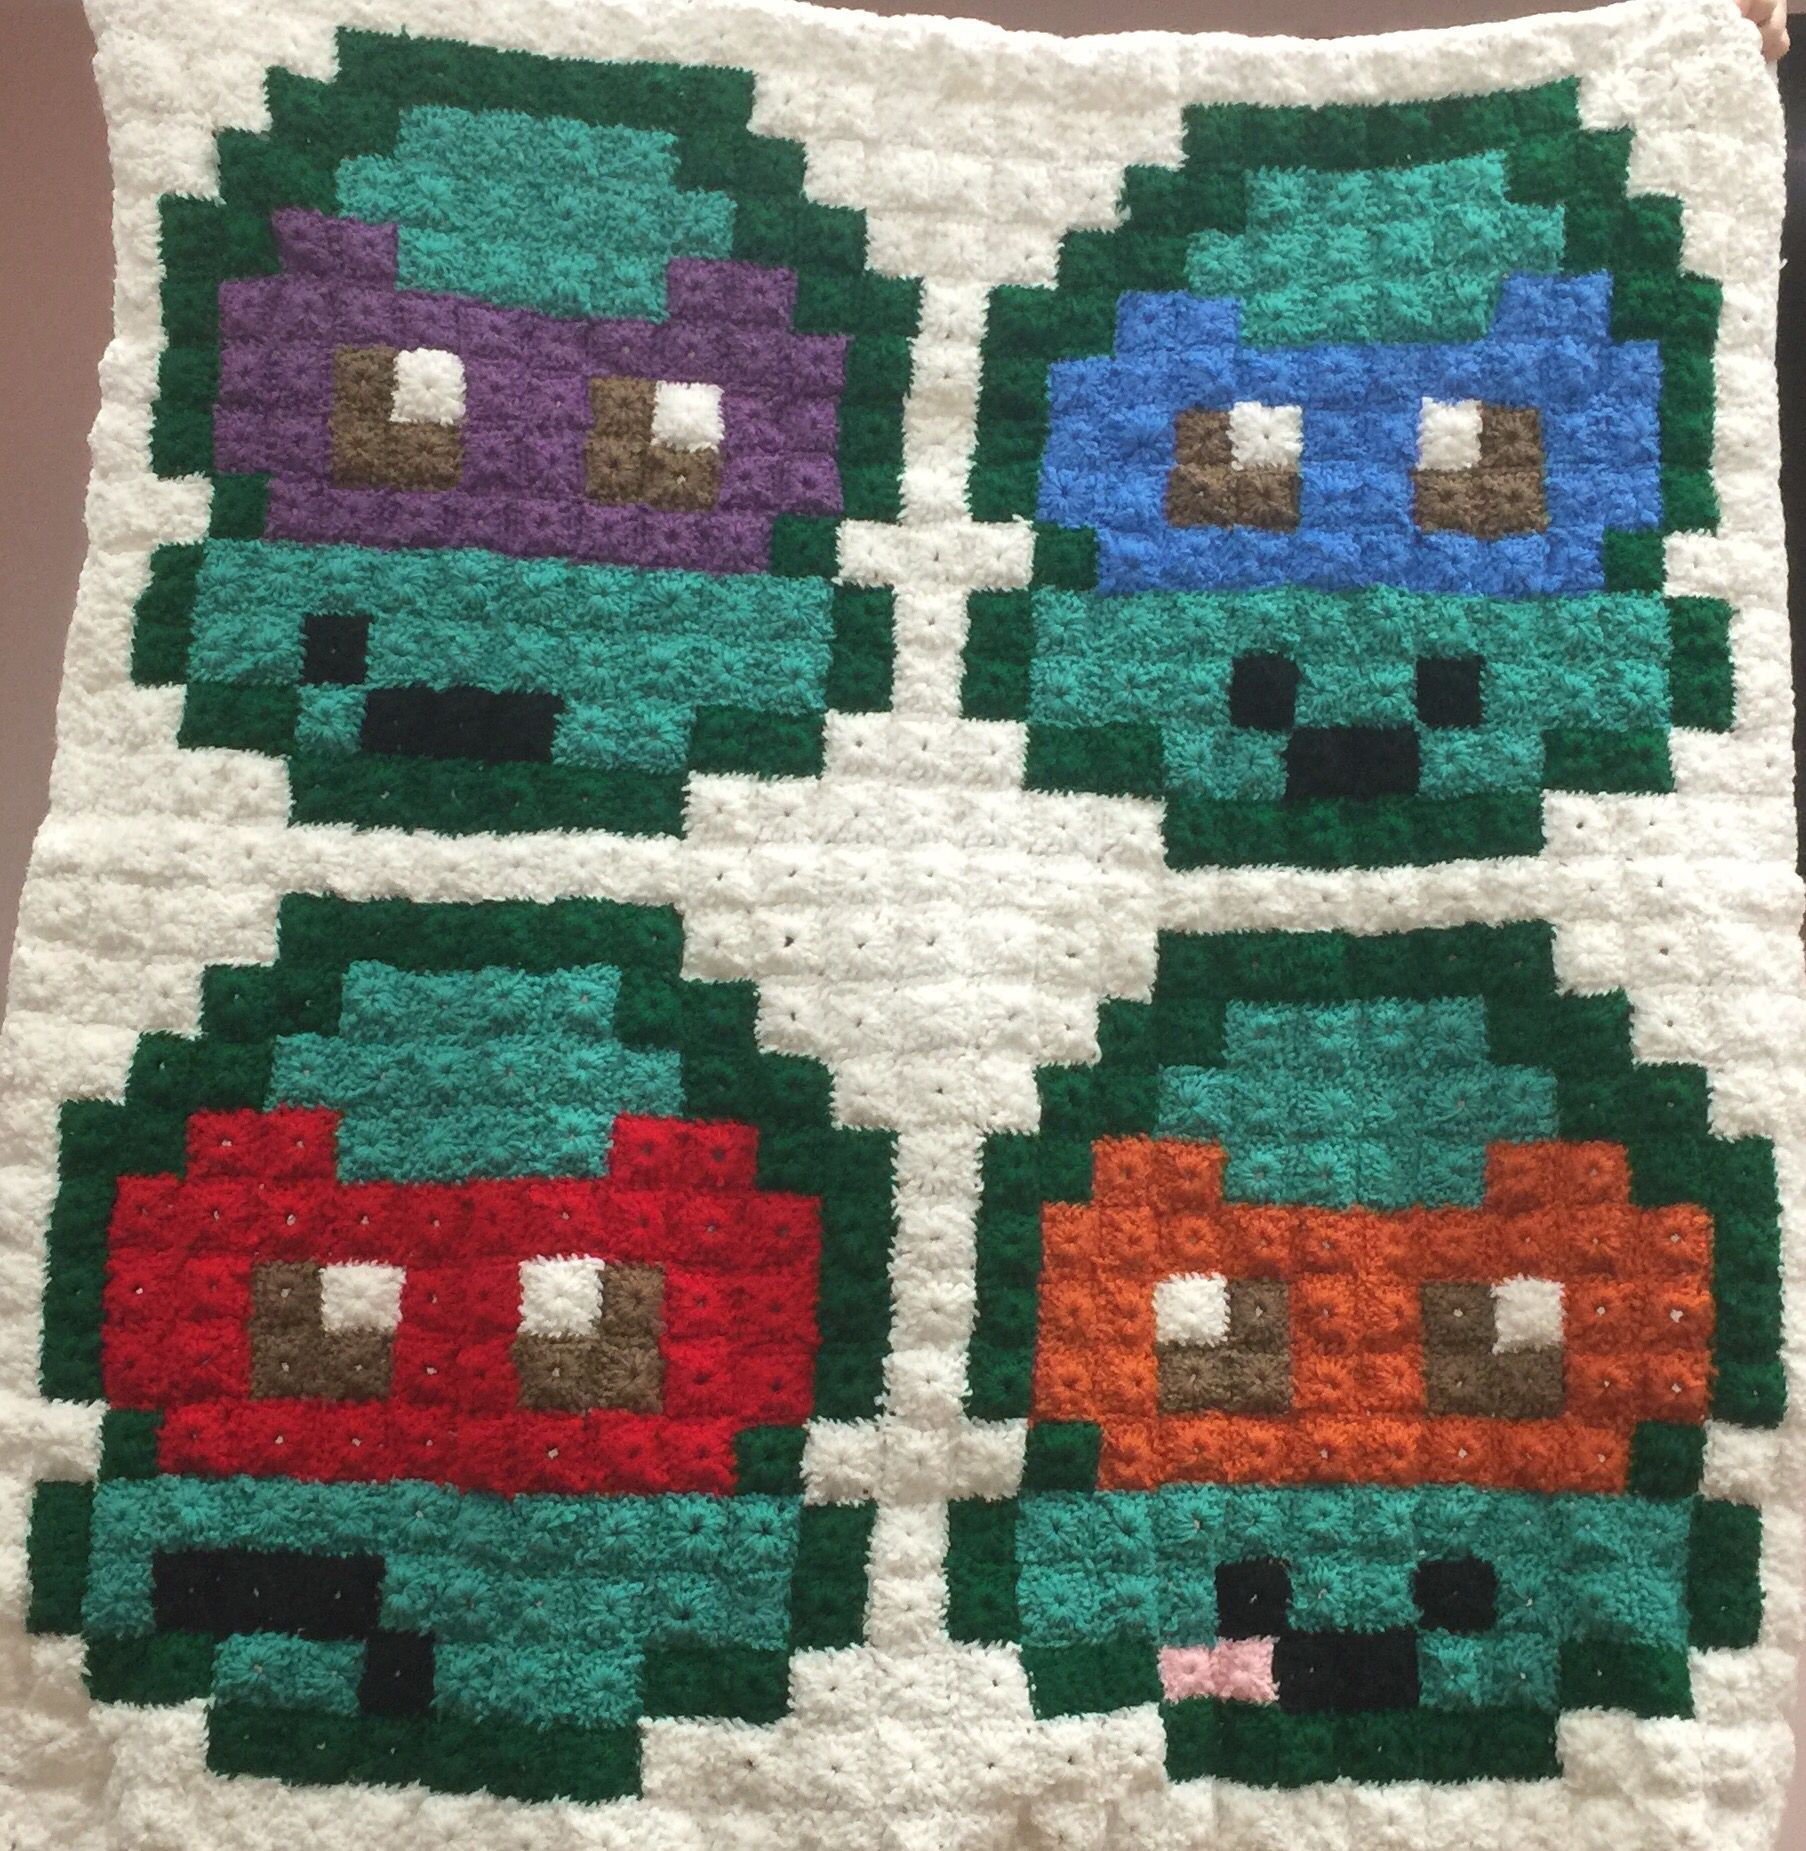 Pin By Daci Rosevear On Crochet Beading Patterns Crochet